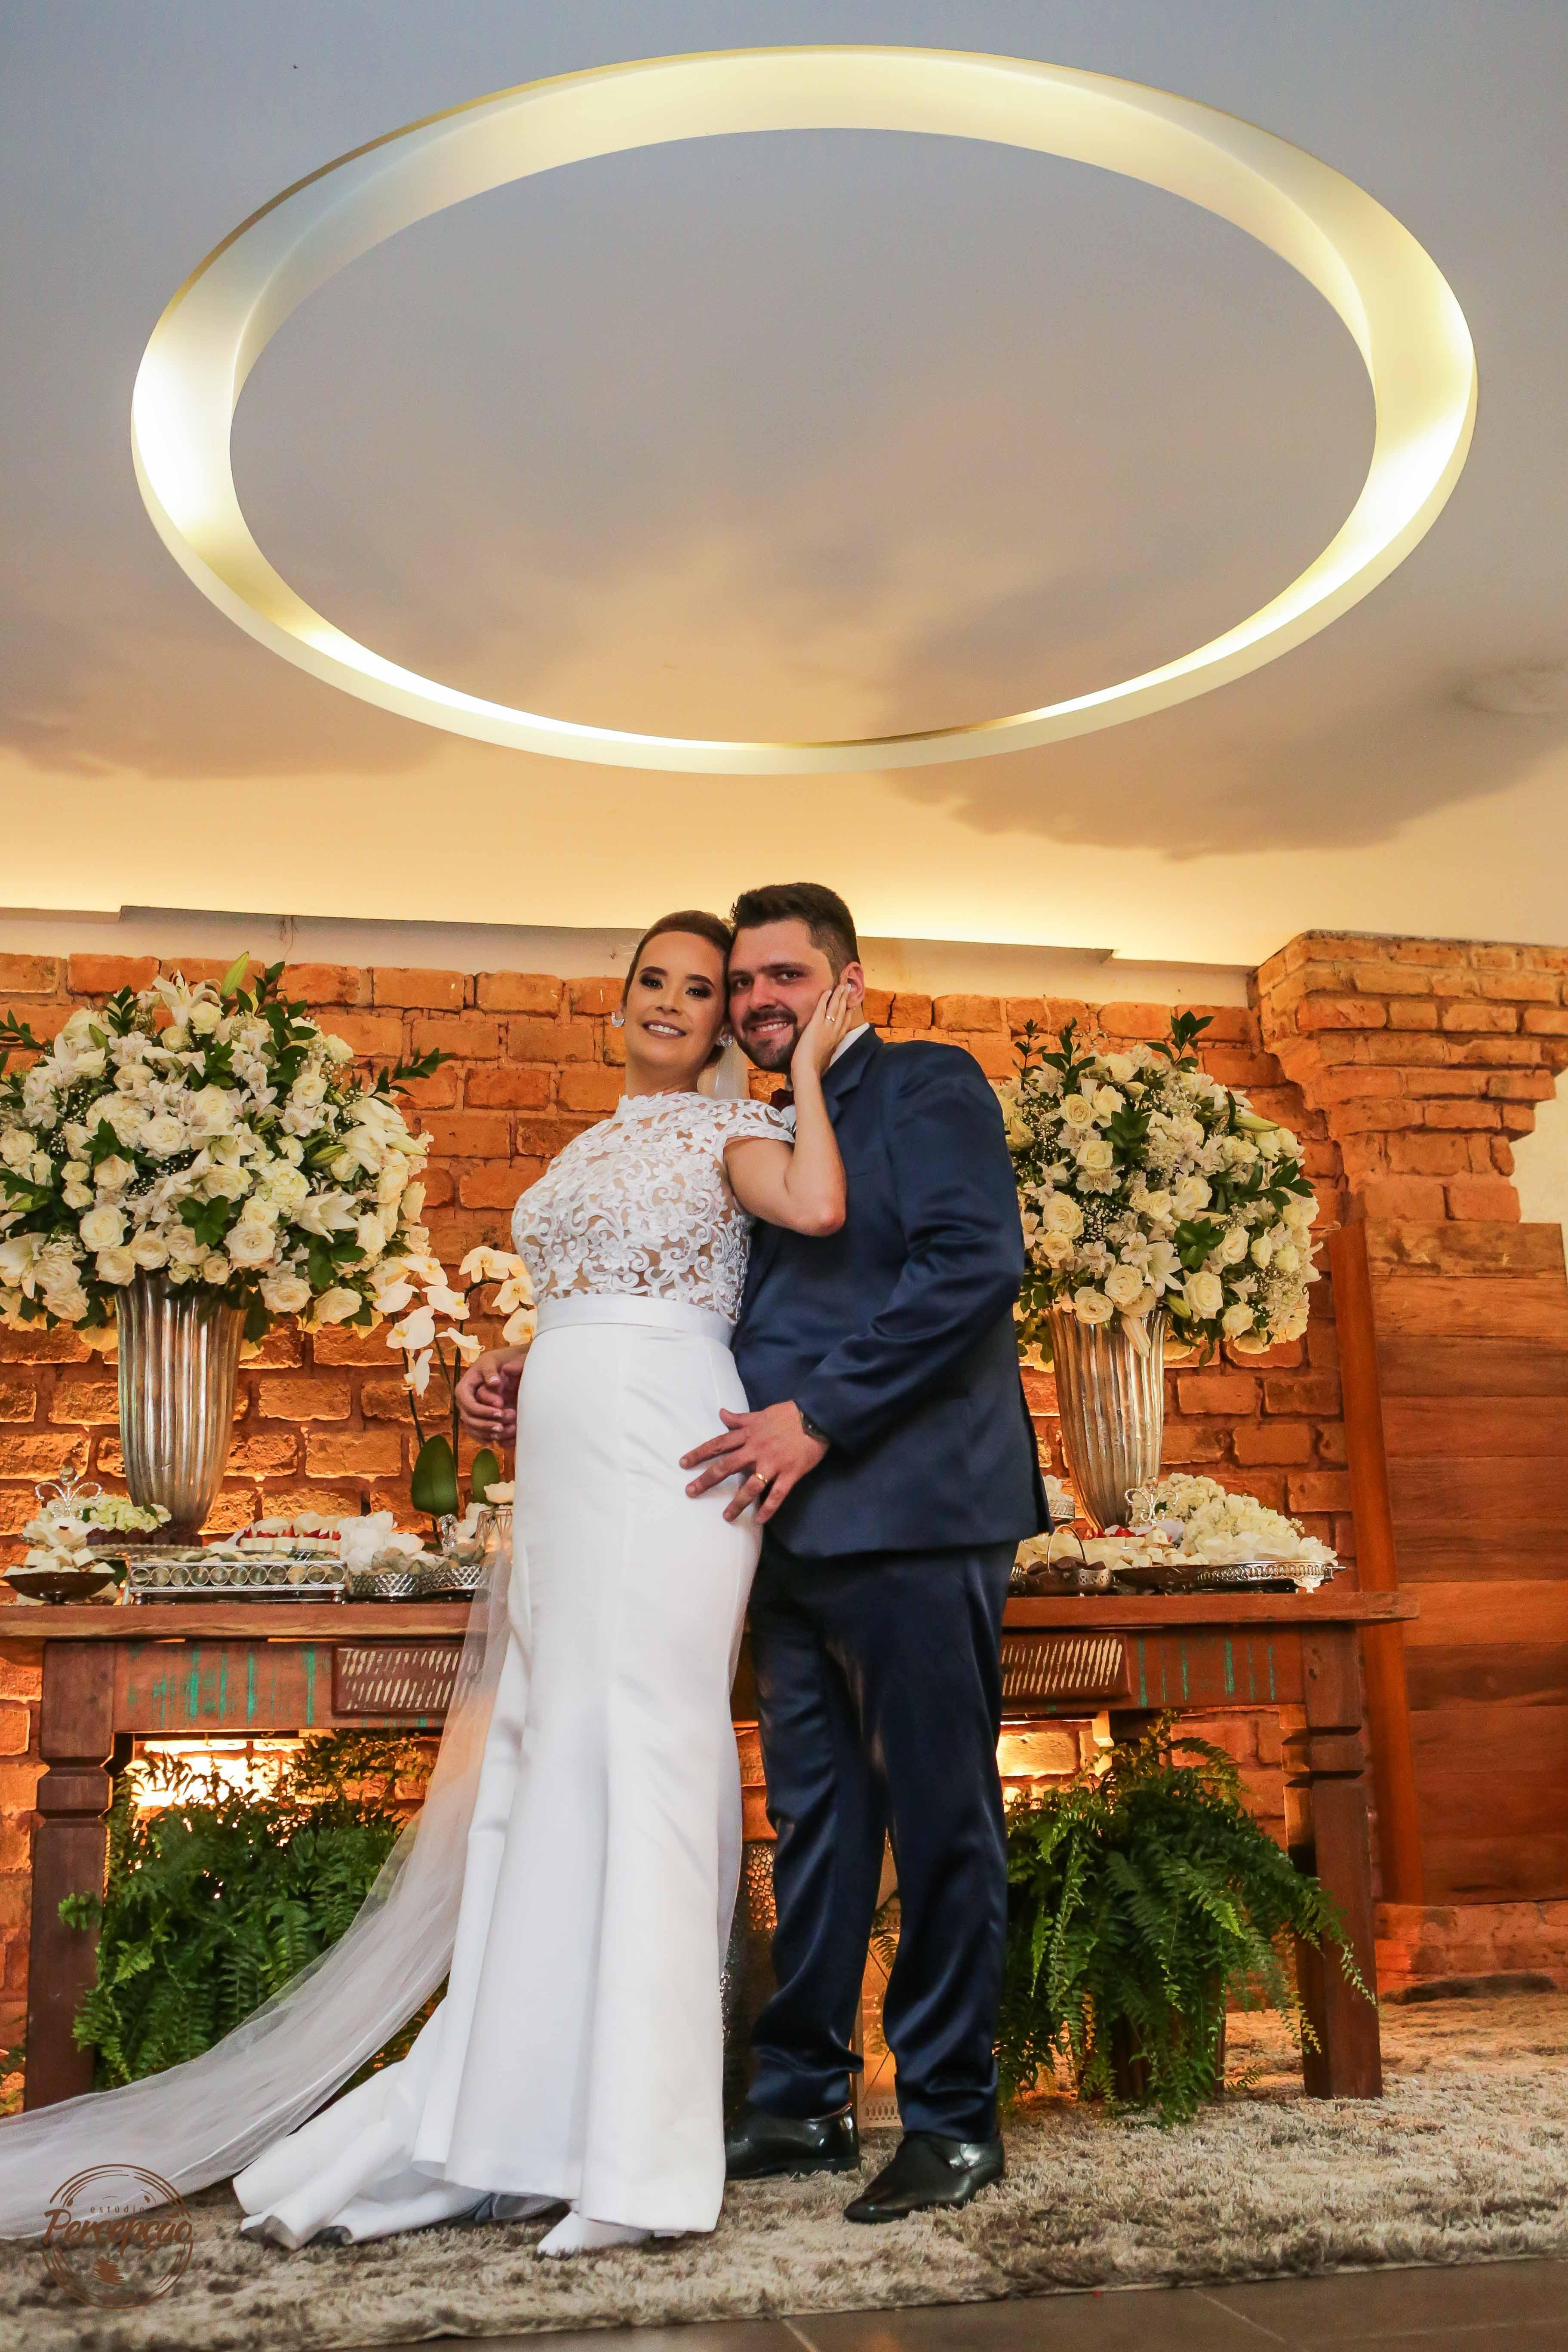 Casamento_de_Thiago_e_Lívia_internet-359